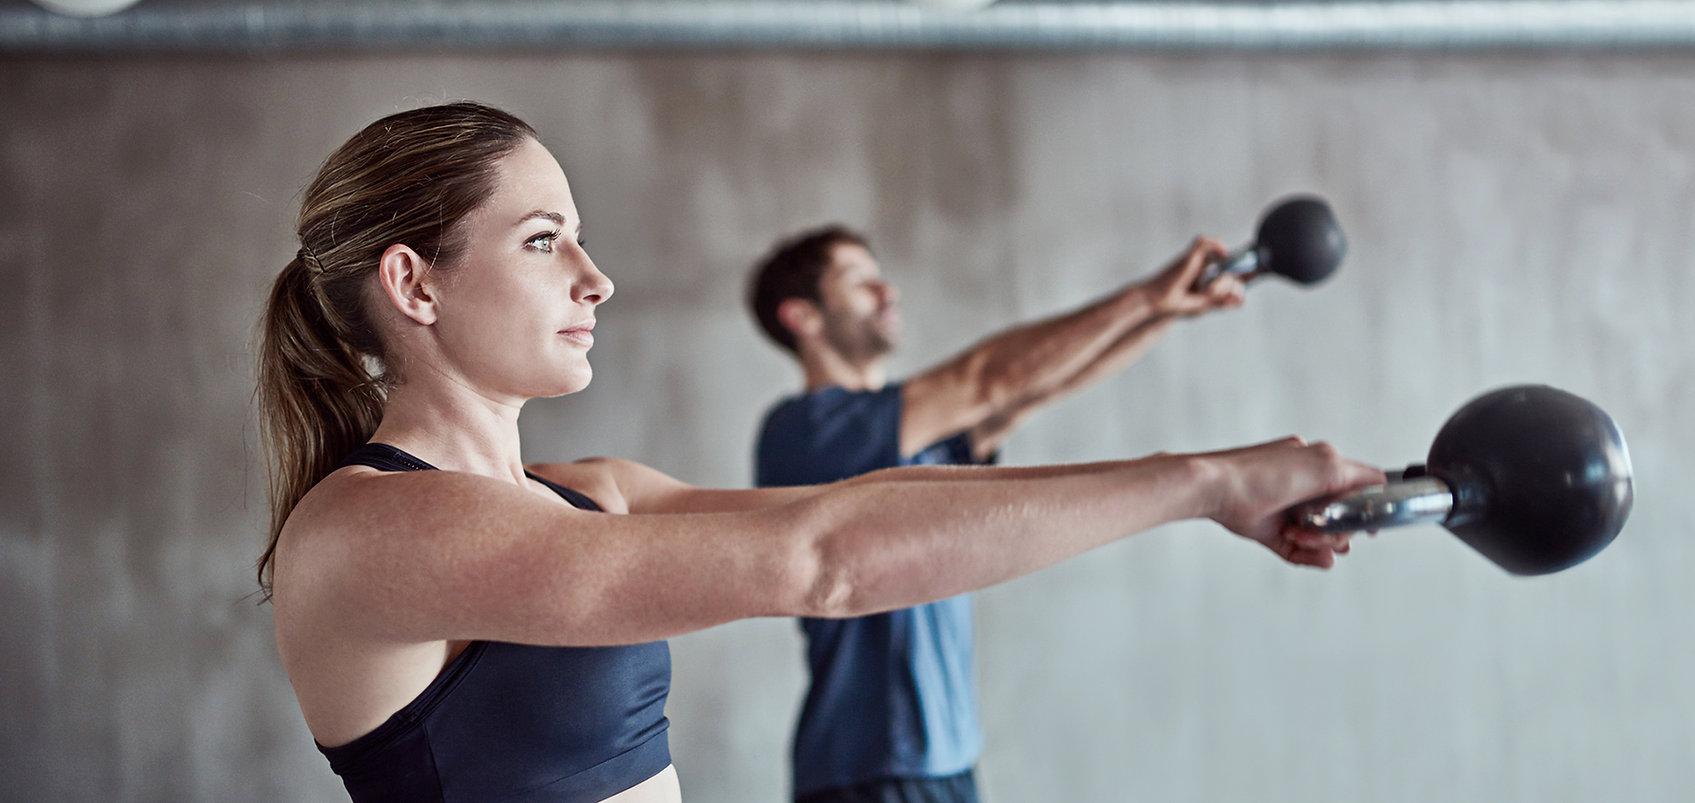 Fitness trainers swinging kettlebells.